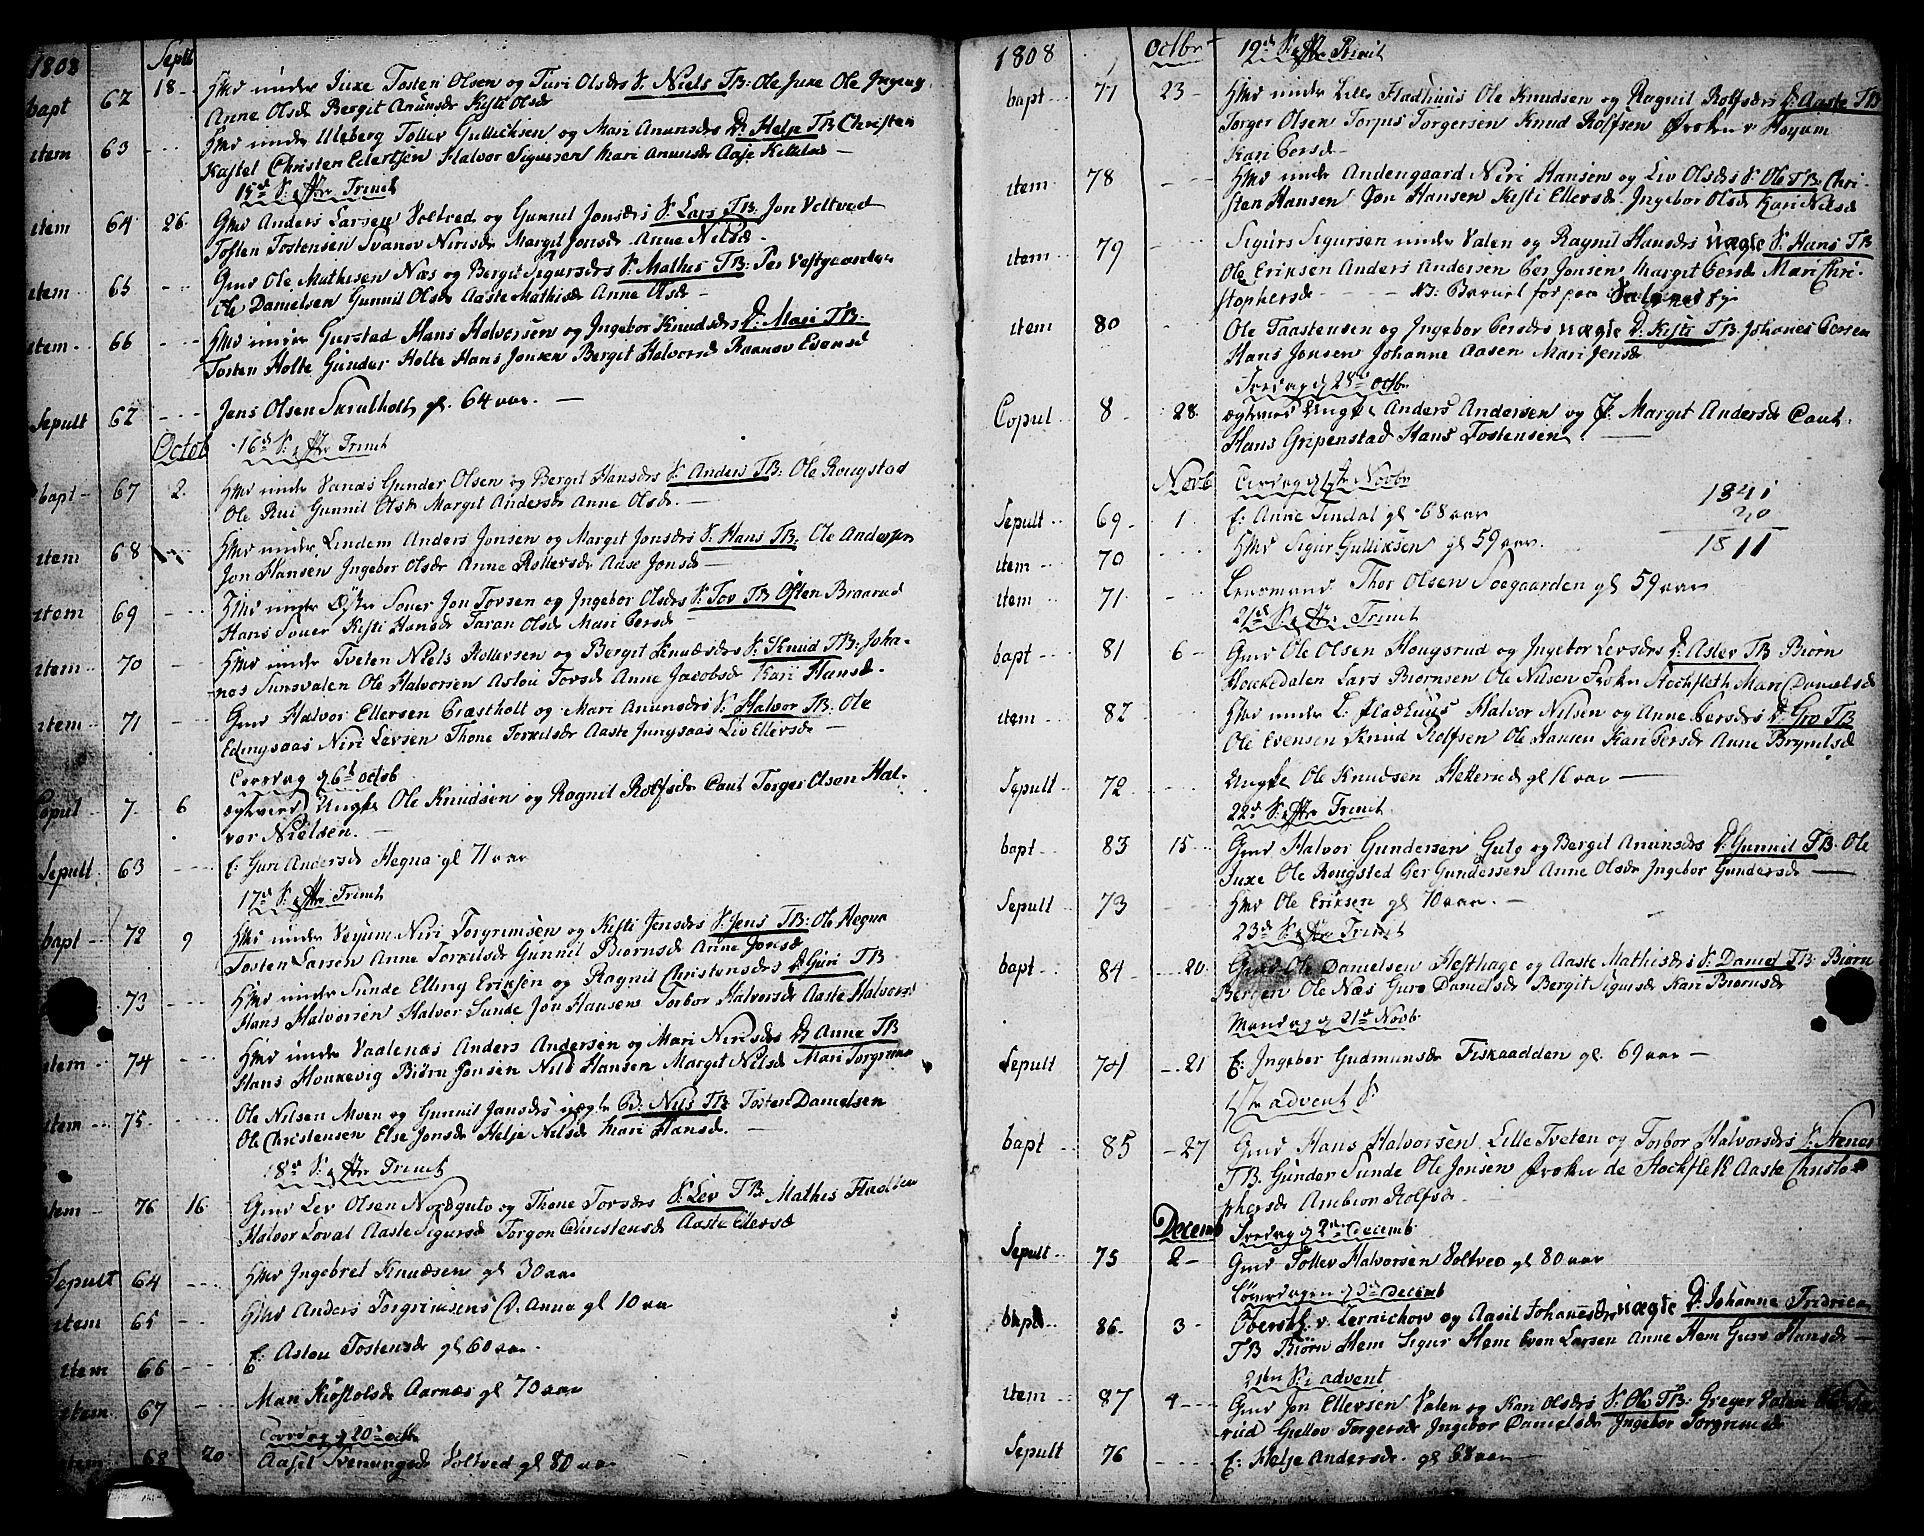 SAKO, Sauherad kirkebøker, F/Fa/L0004: Ministerialbok nr. I 4, 1767-1814